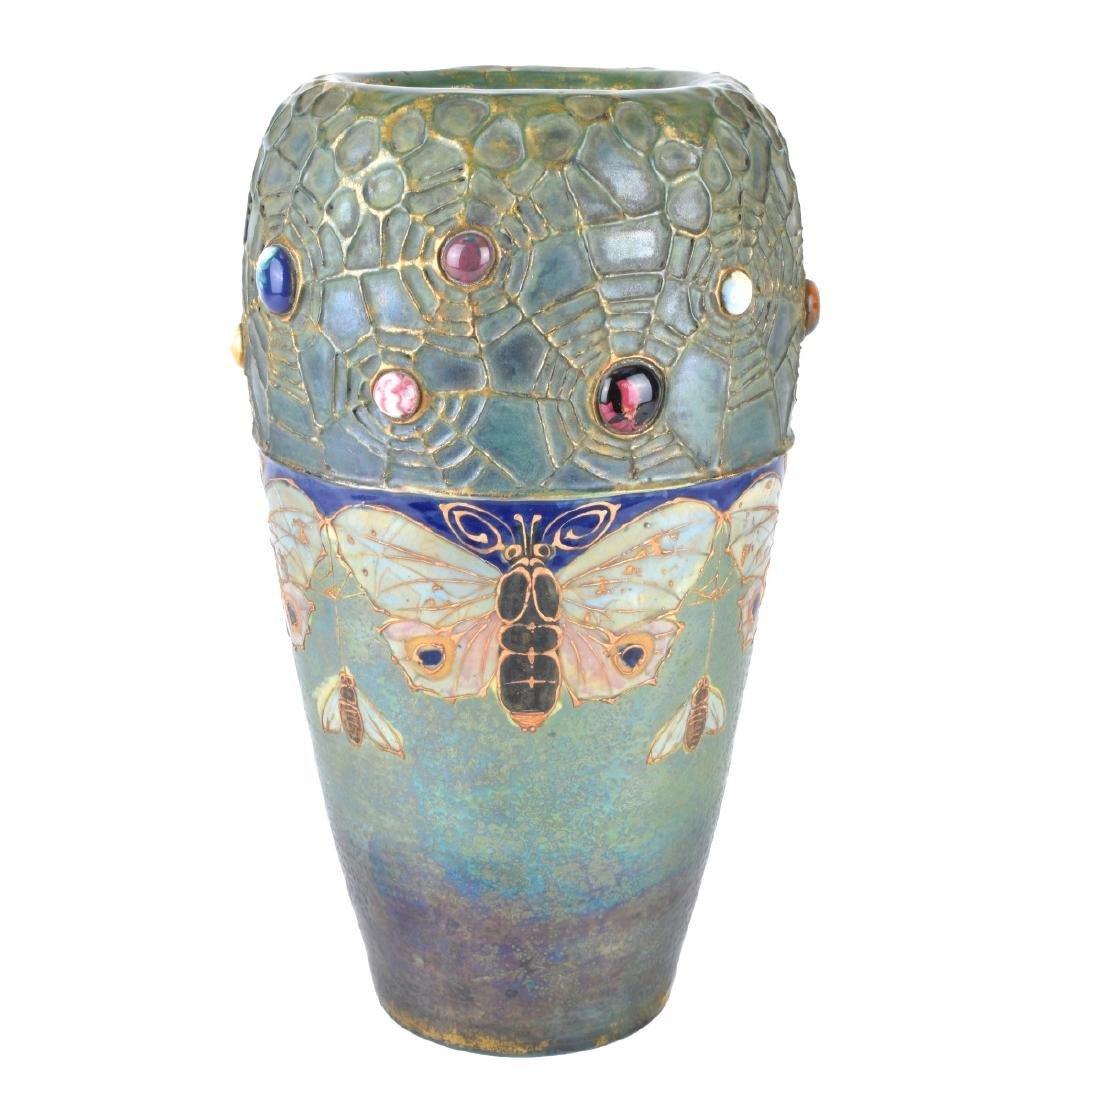 Turn Teplitz Amphora Gres Bijou Pottery Vase